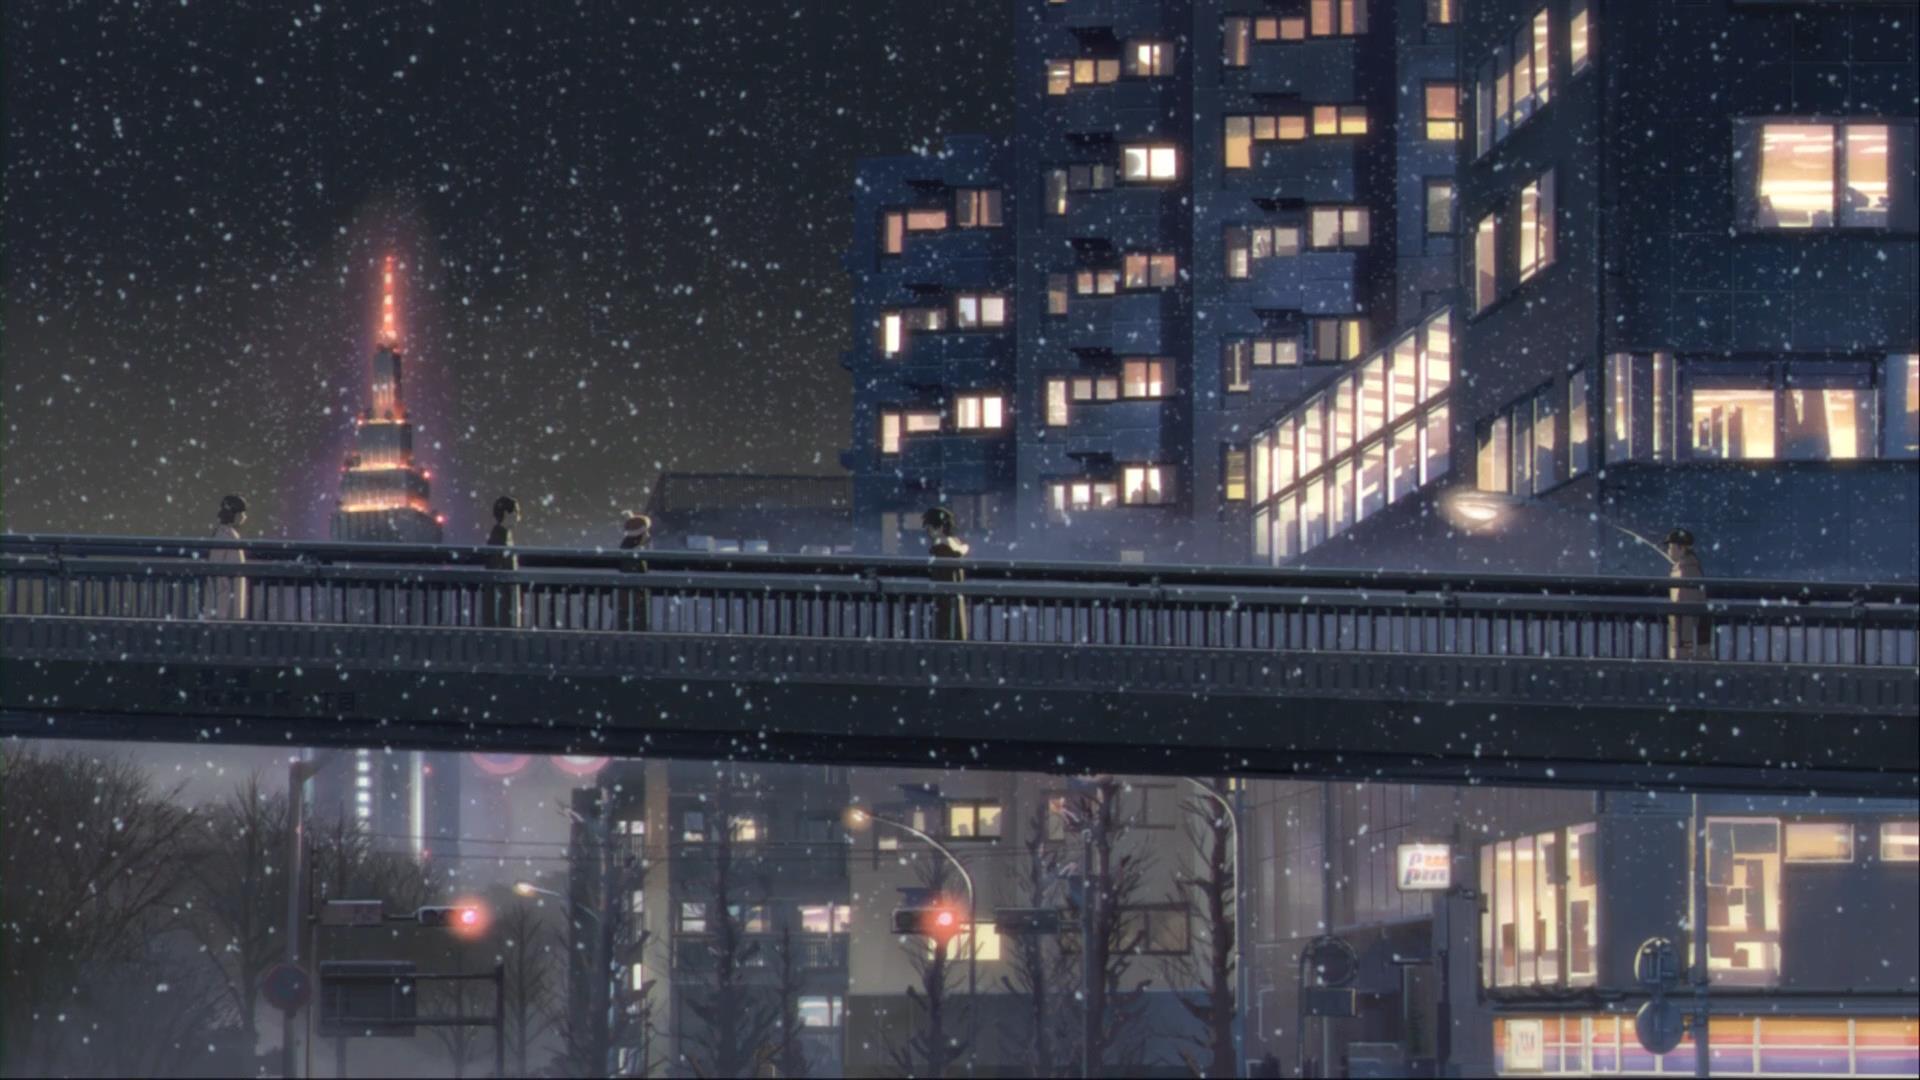 5cm night scene from Harajuku